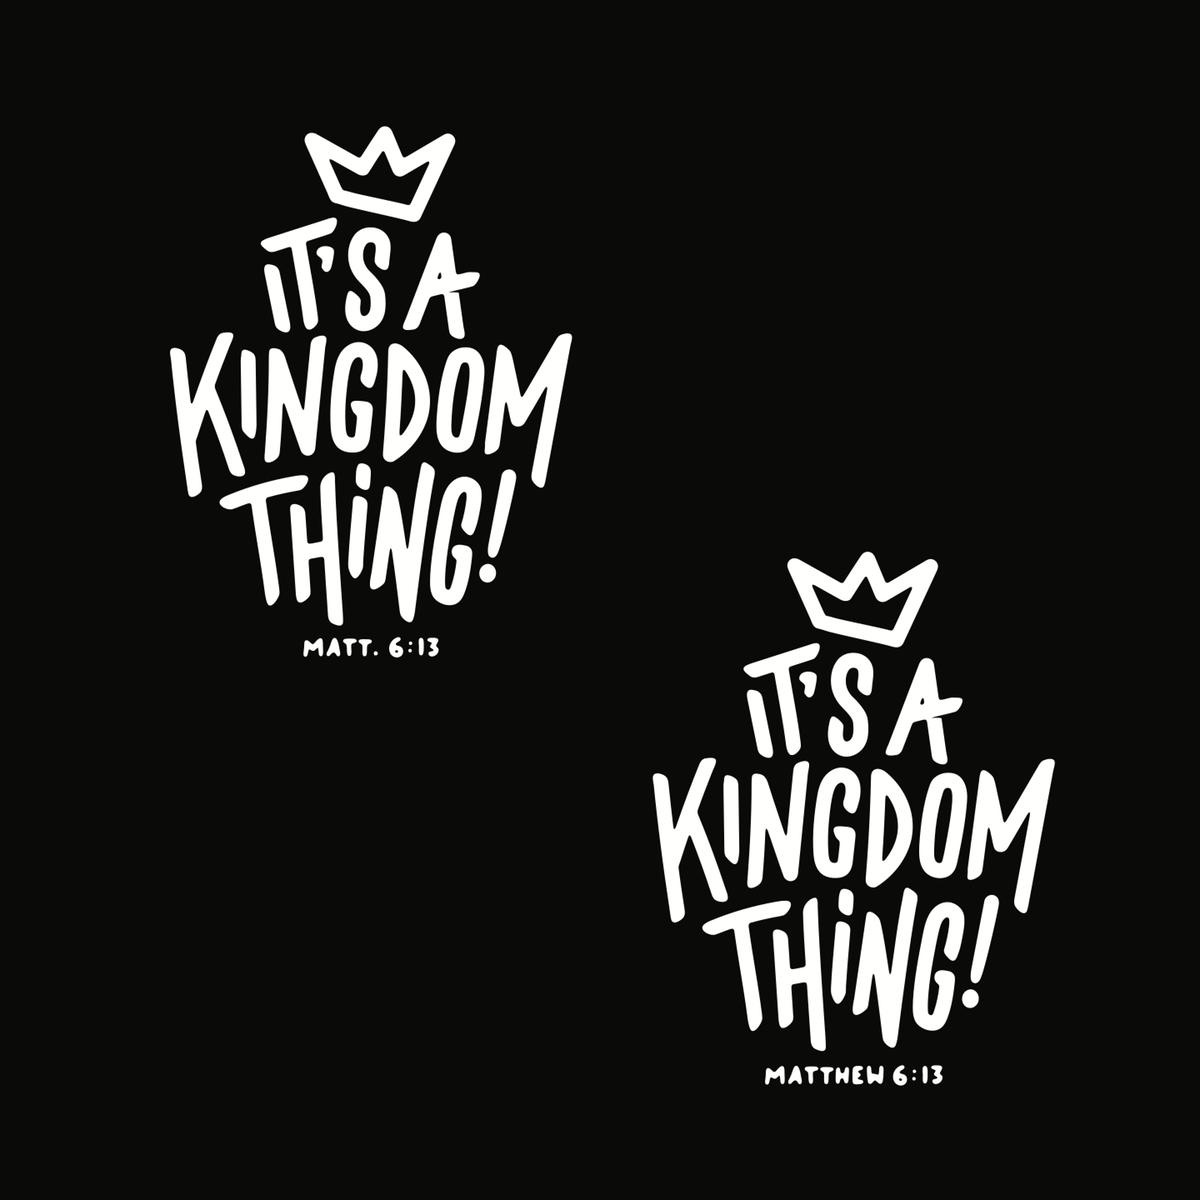 Go Brand T-shirt Designs (Bible Verses)